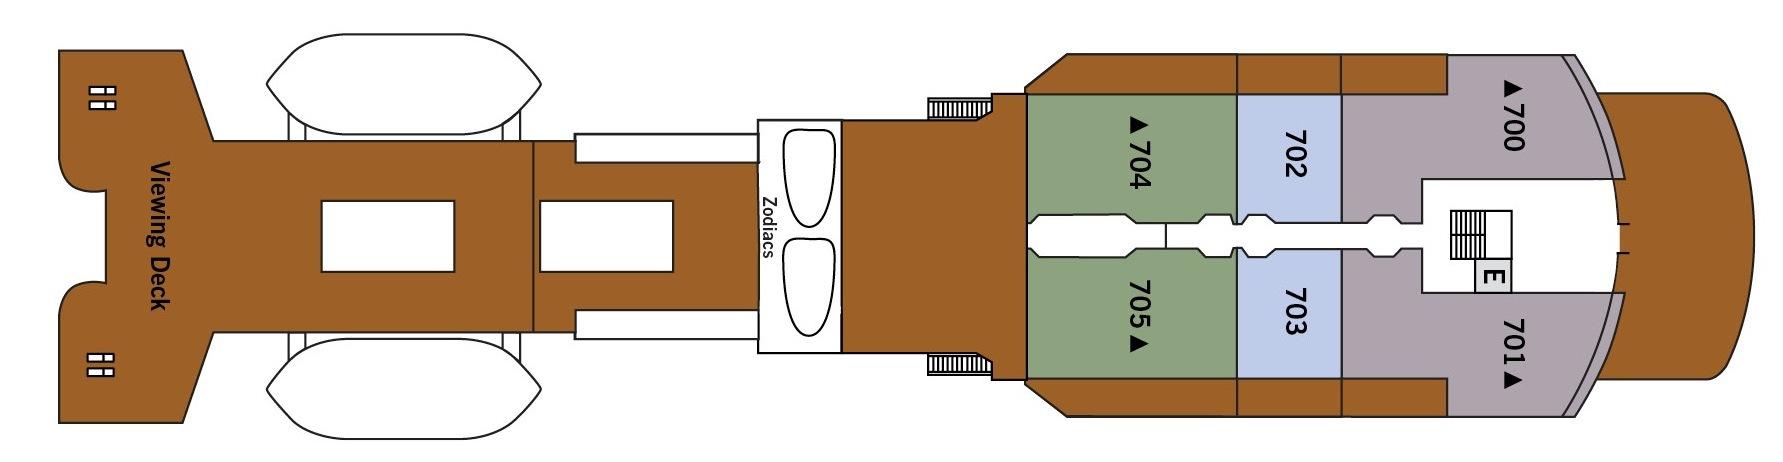 Silversea Cruises Silver Explorer Deck Plans Deck 7.jpeg